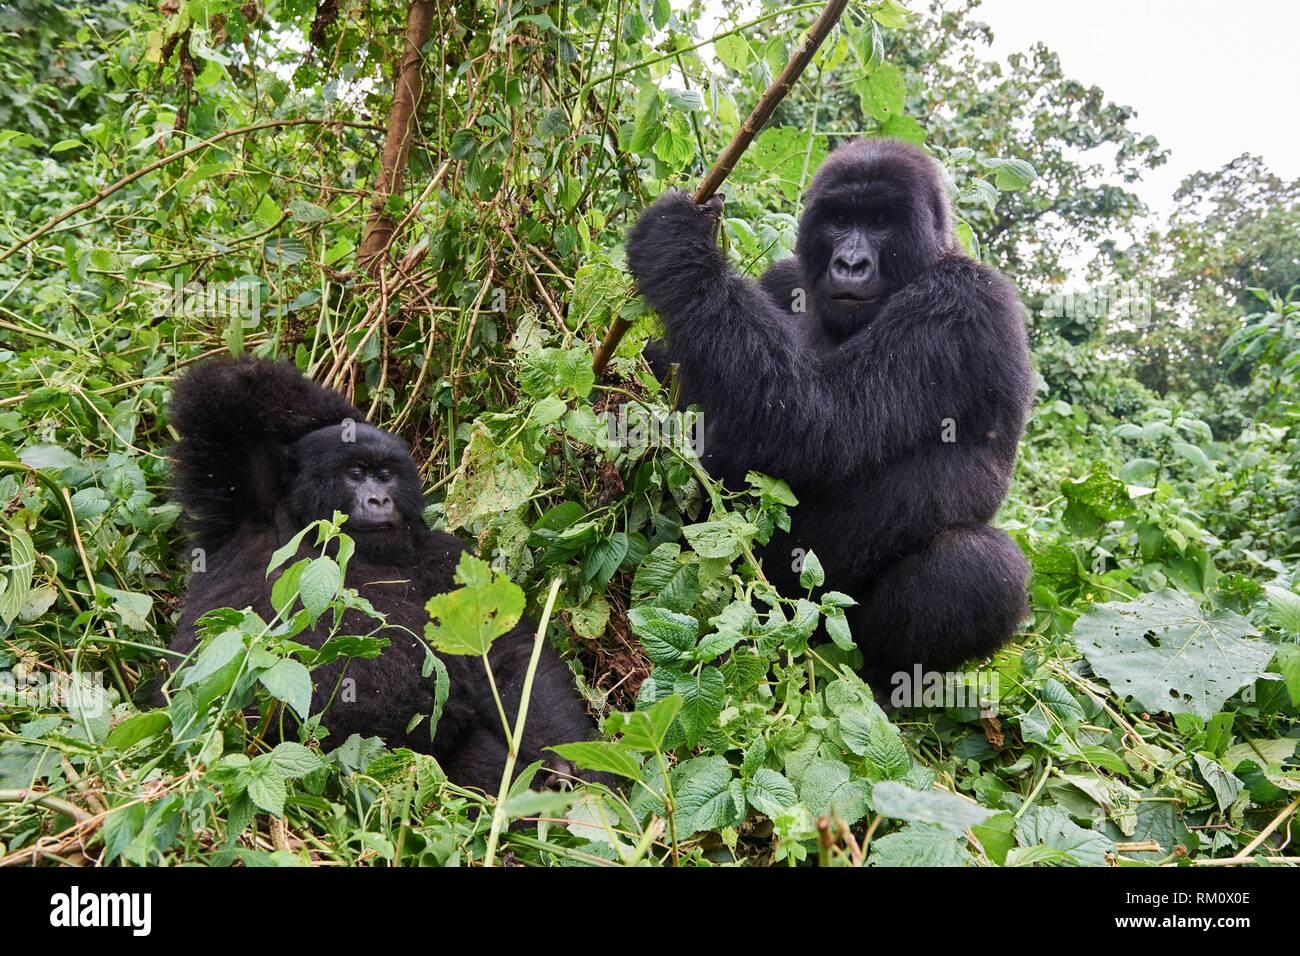 Silverback Mountain gorilla (Gorilla beringei beringei) with female. Virunga National Park, North Kivu, Democratic Republic of Congo, Africa. - Stock Image